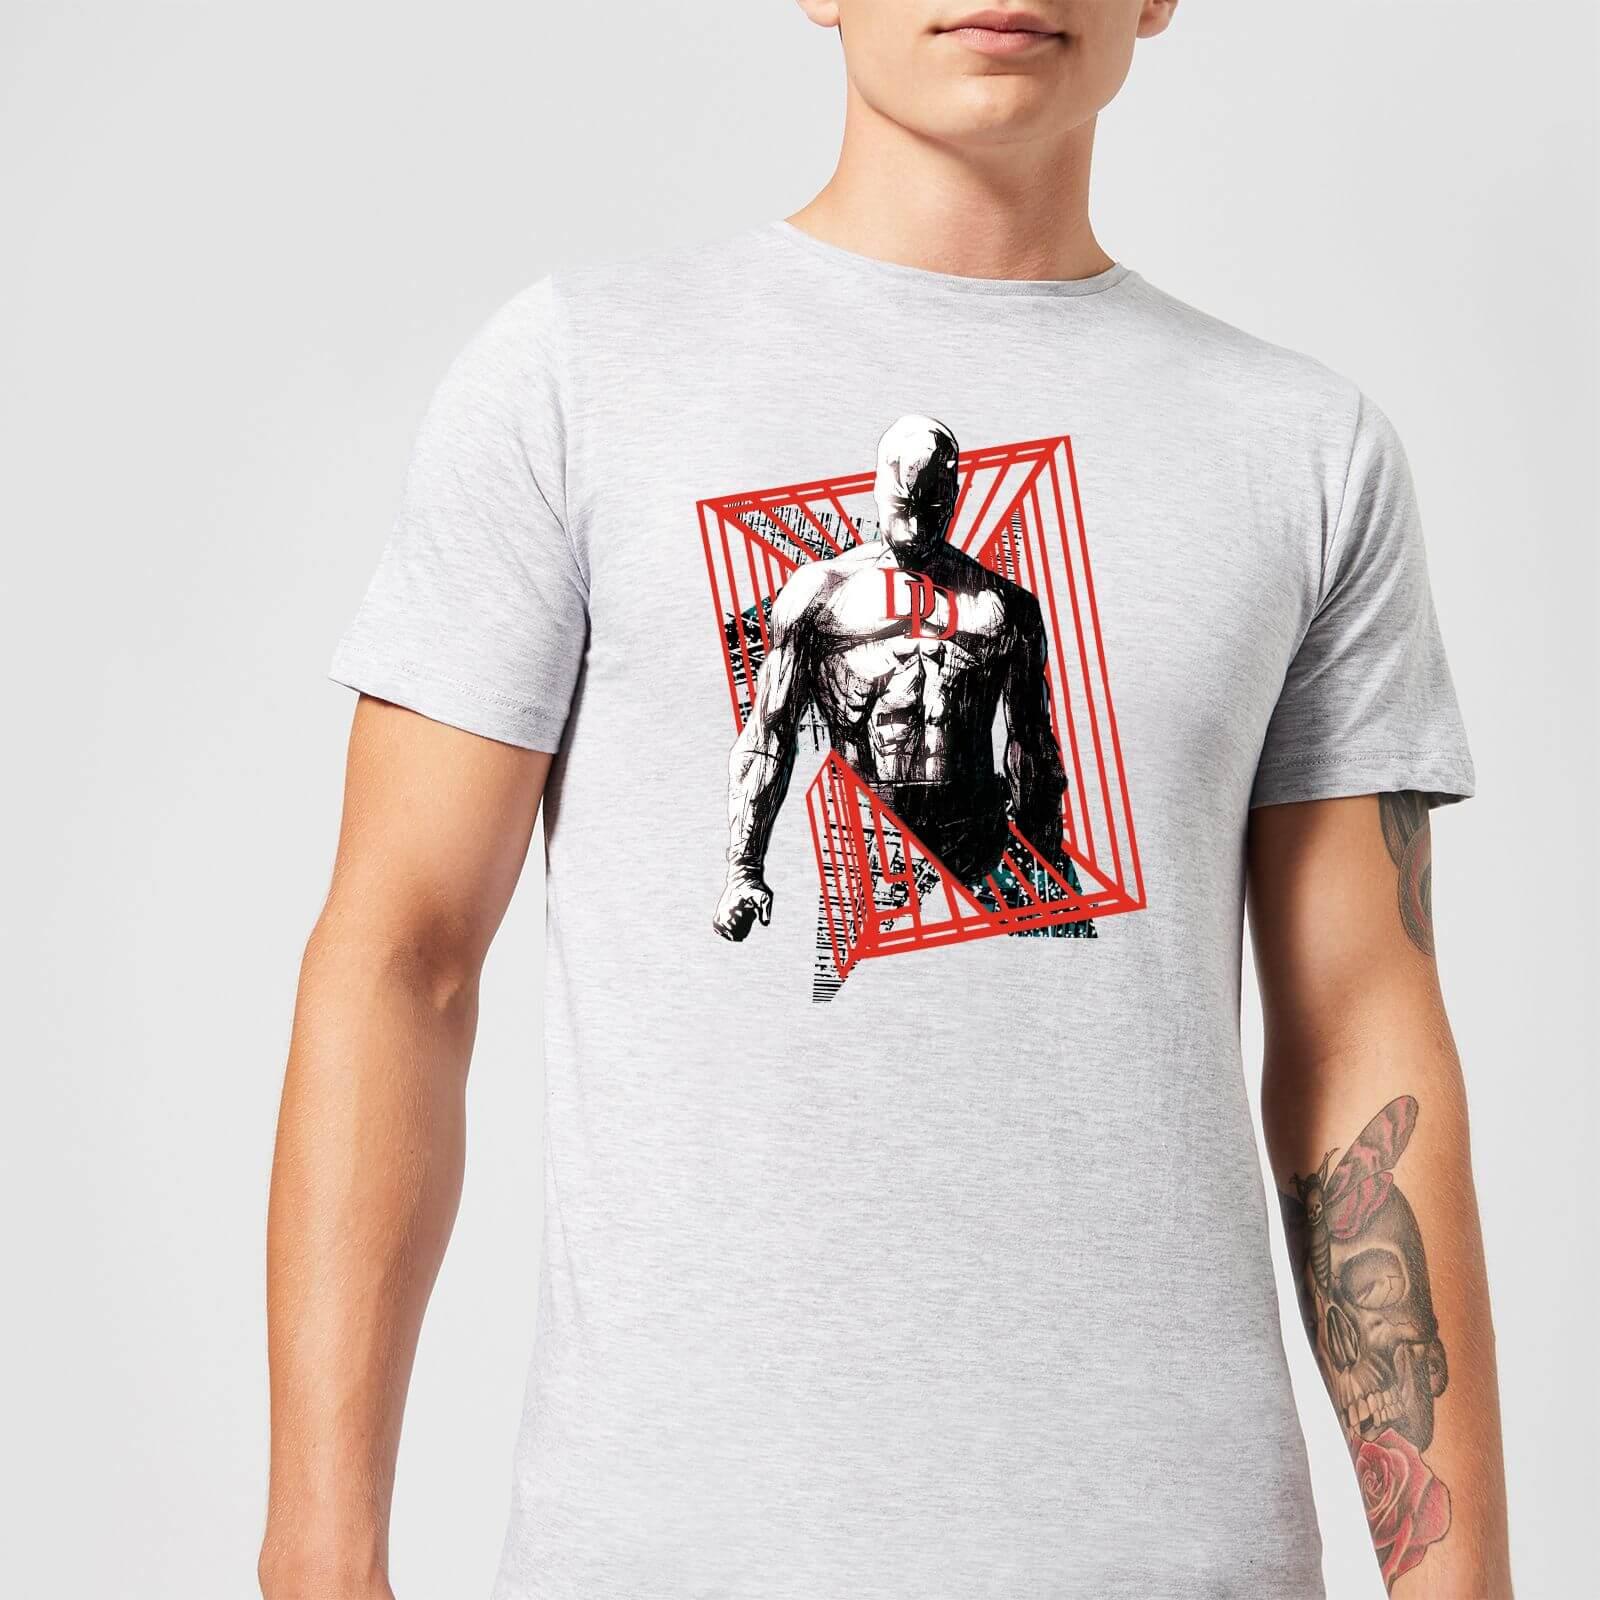 OfferteWeb.click 25-t-shirt-marvel-knights-daredevil-cage-grigio-uomo-xxl